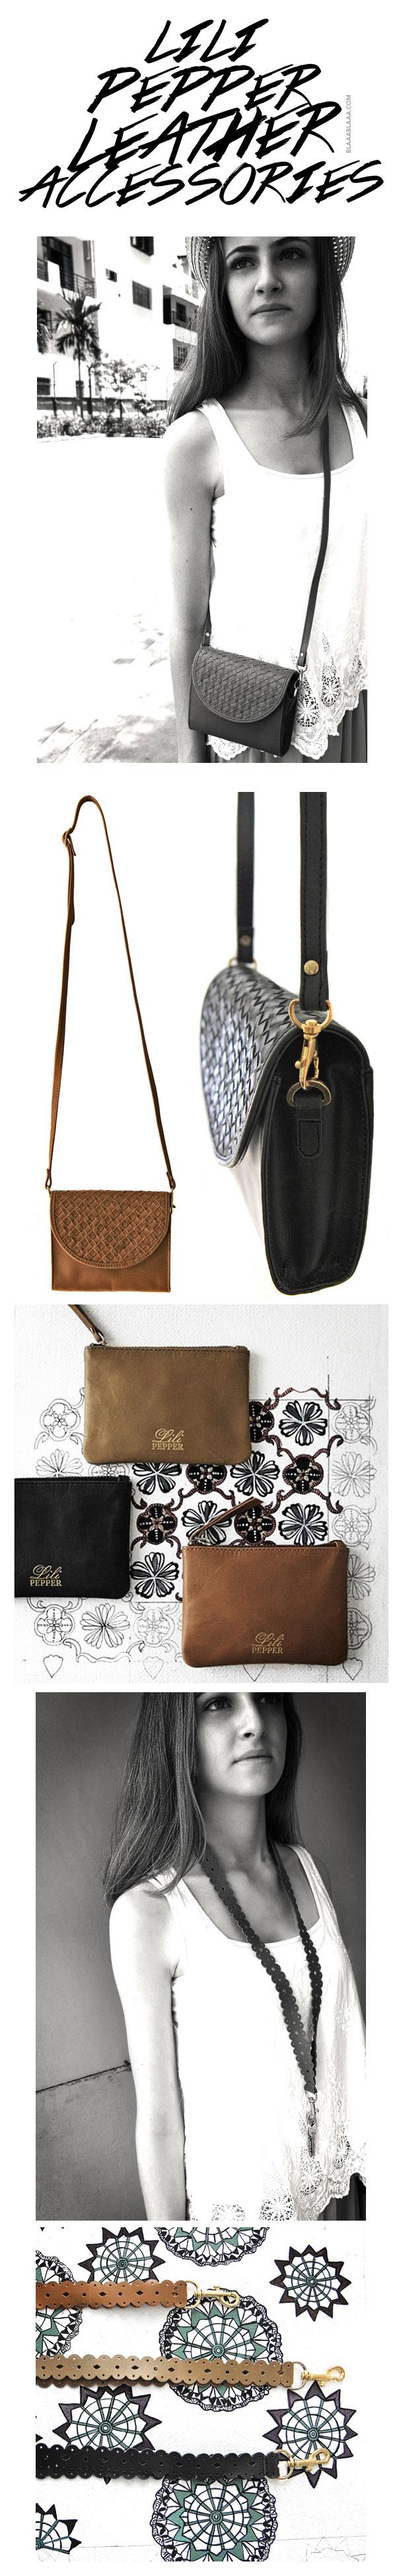 Lili Pepper Leather Accessories